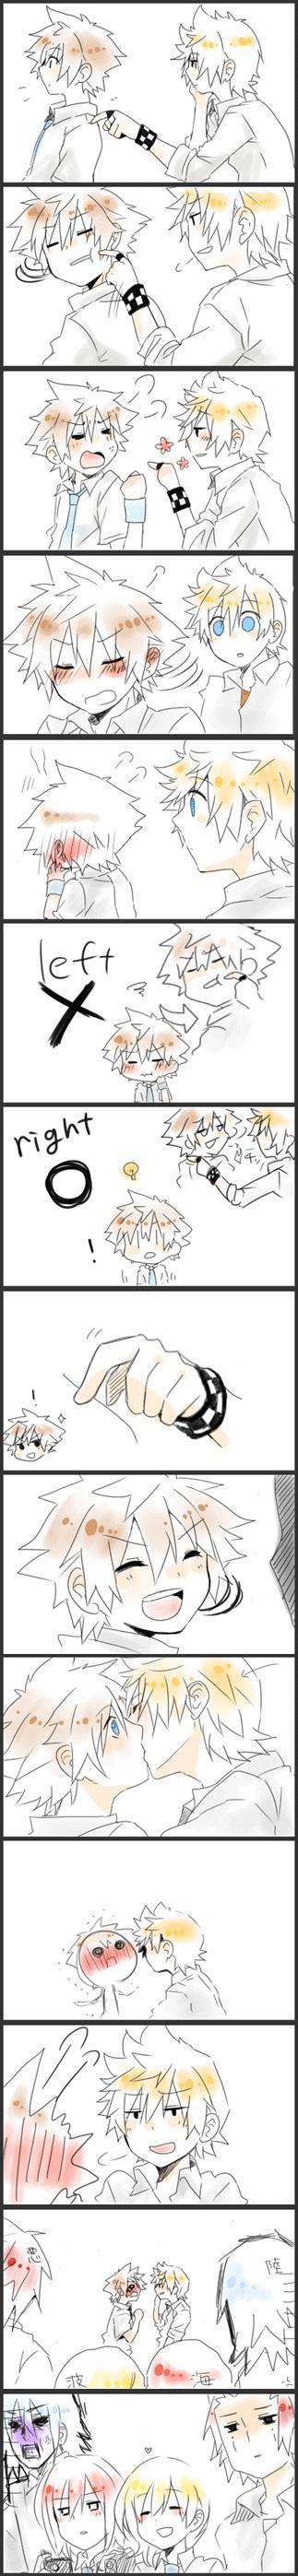 Tags: Anime, Kingdom Hearts, Kingdom Hearts 358/2 Days, Kingdom Hearts II, Riku (Kingdom Hearts), Sora (Kingdom Hearts), Roxas, Naminé, Axel (Kingdom Hearts), Kairi (Kingdom Hearts), Organization XIII